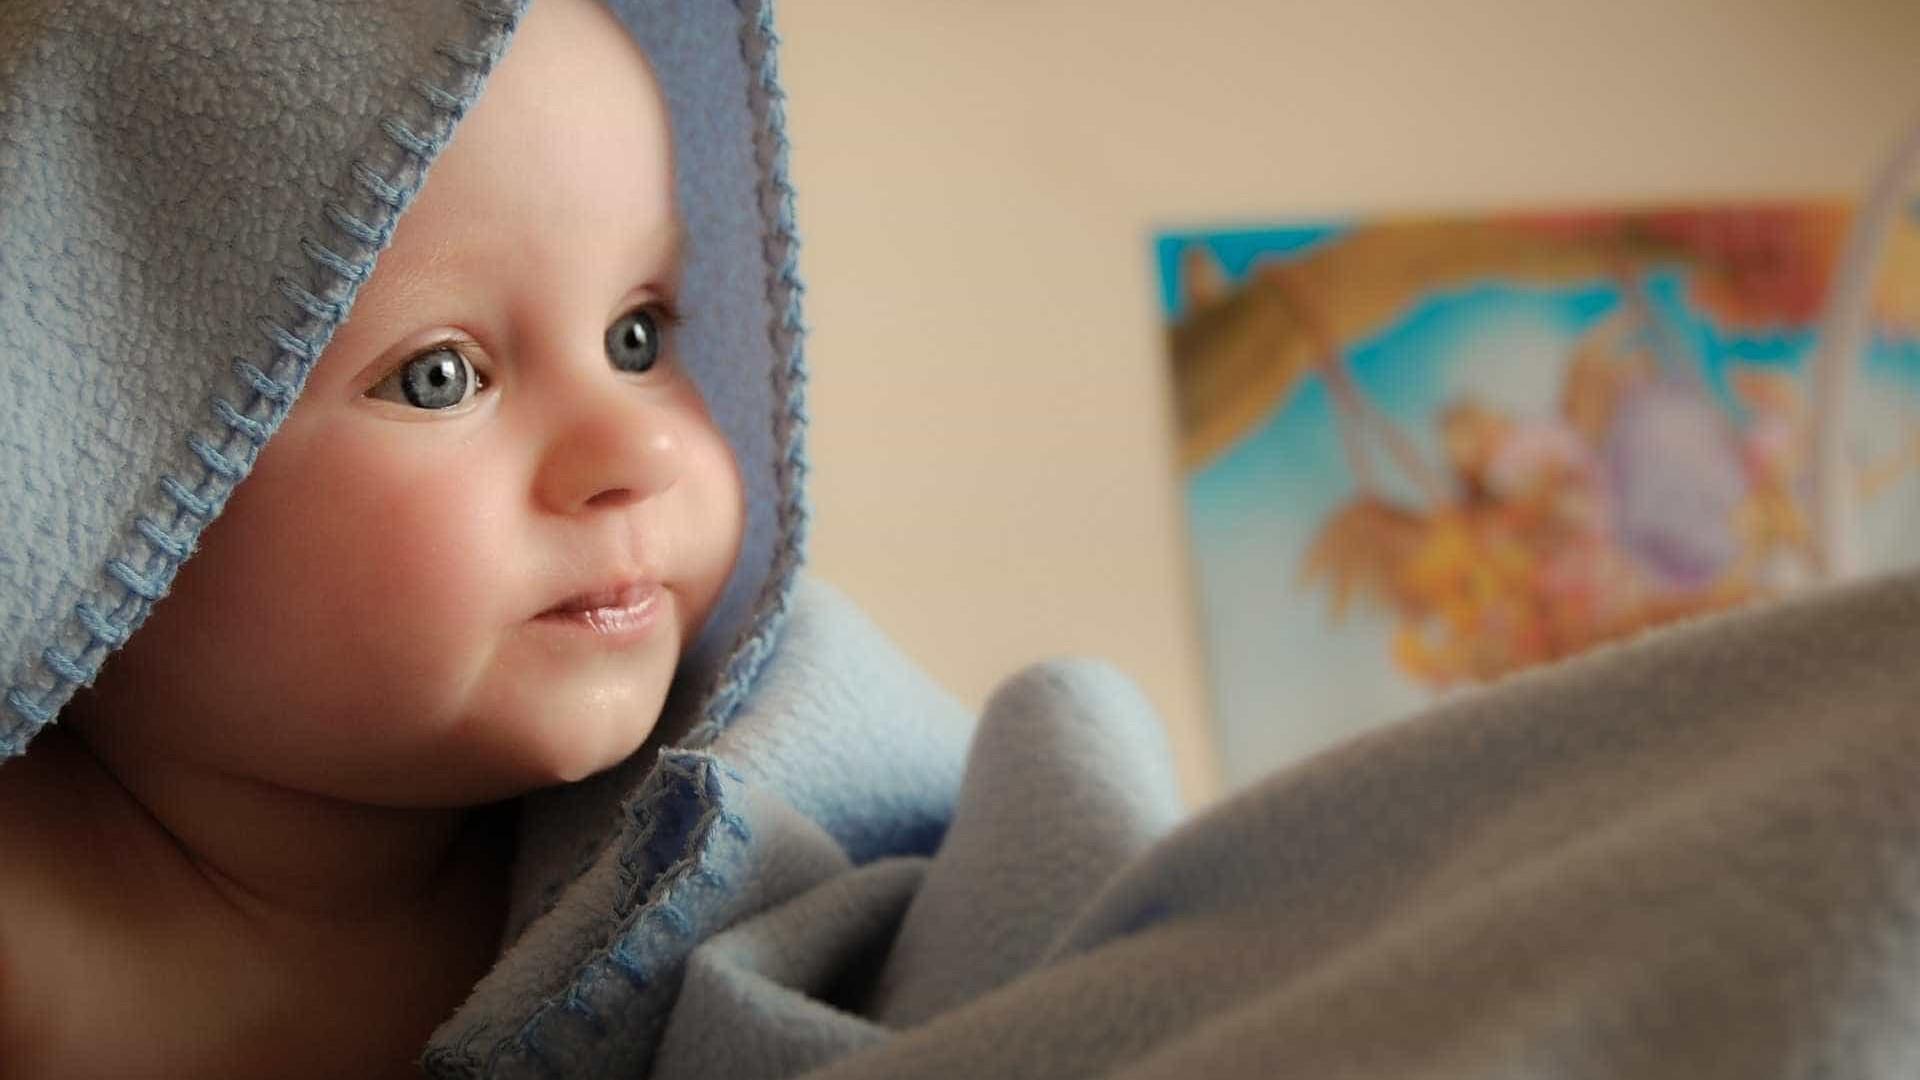 Nova técnica põe bebés a comer sólidos desde os seis meses